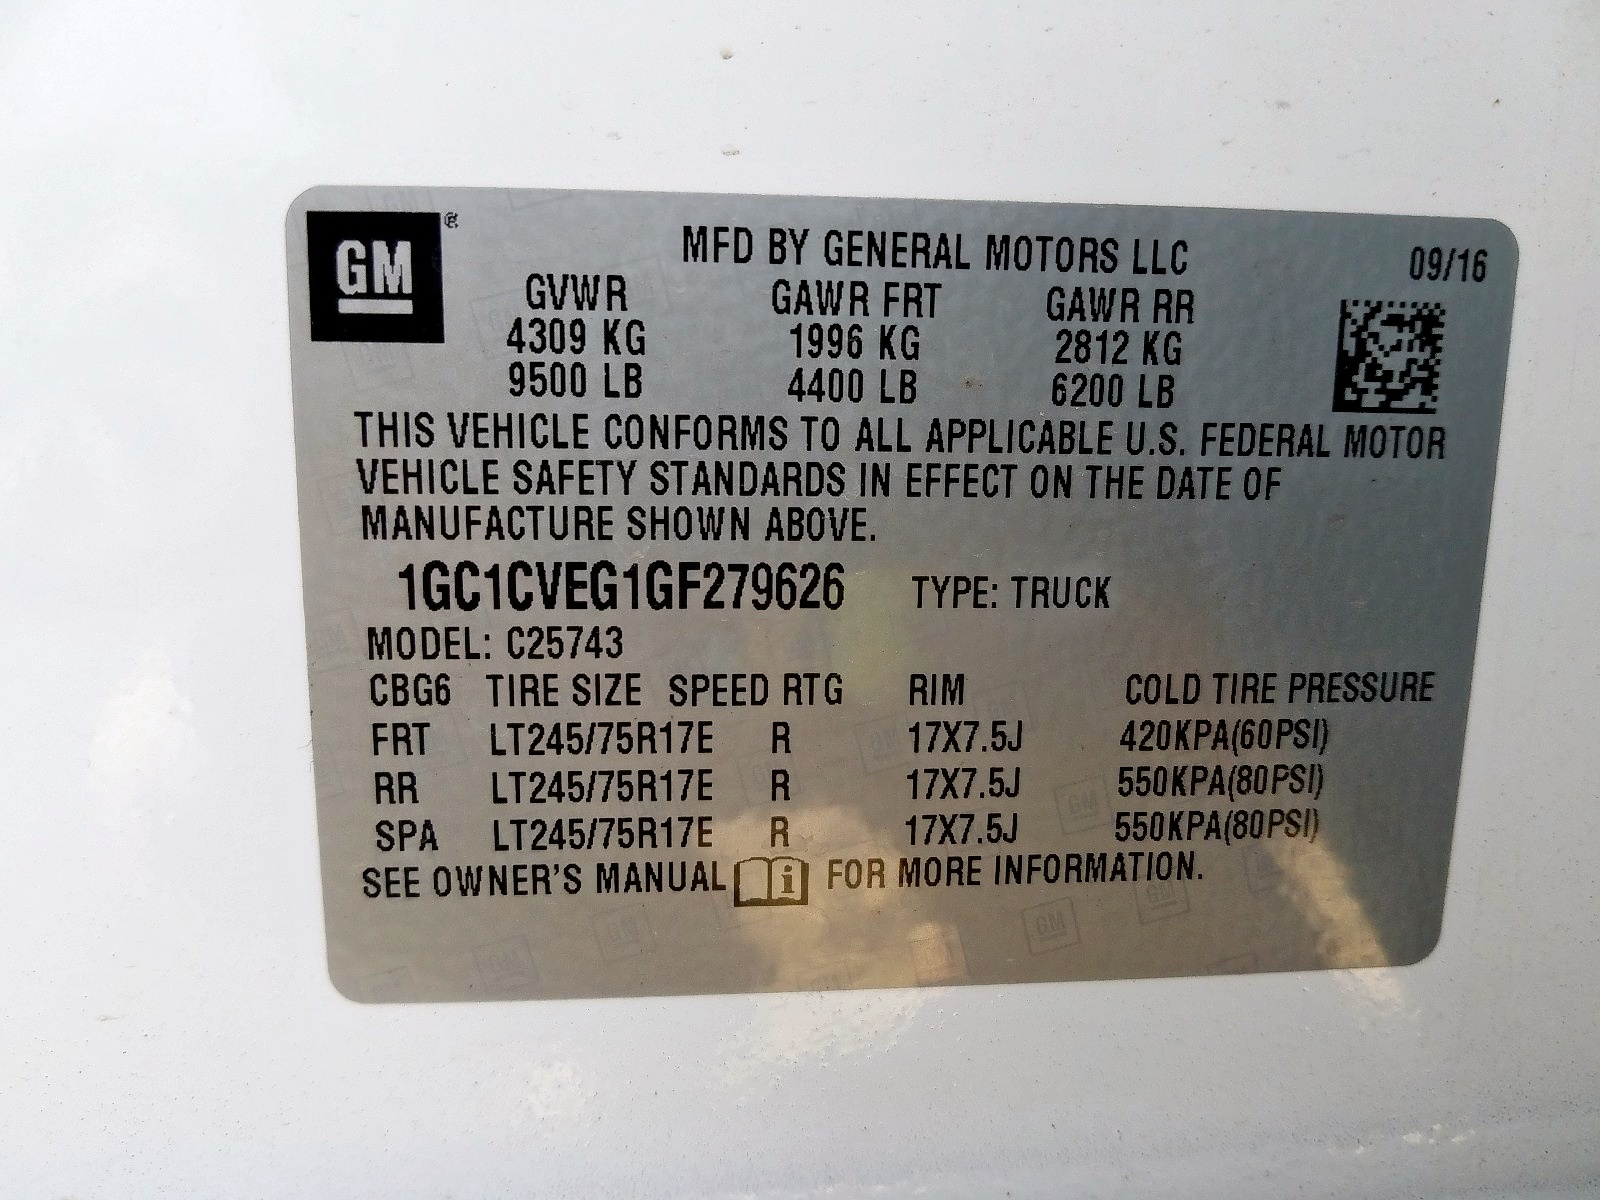 1GC1CVEG1GF279626 - 2016 Chevrolet Silverado 6.0L